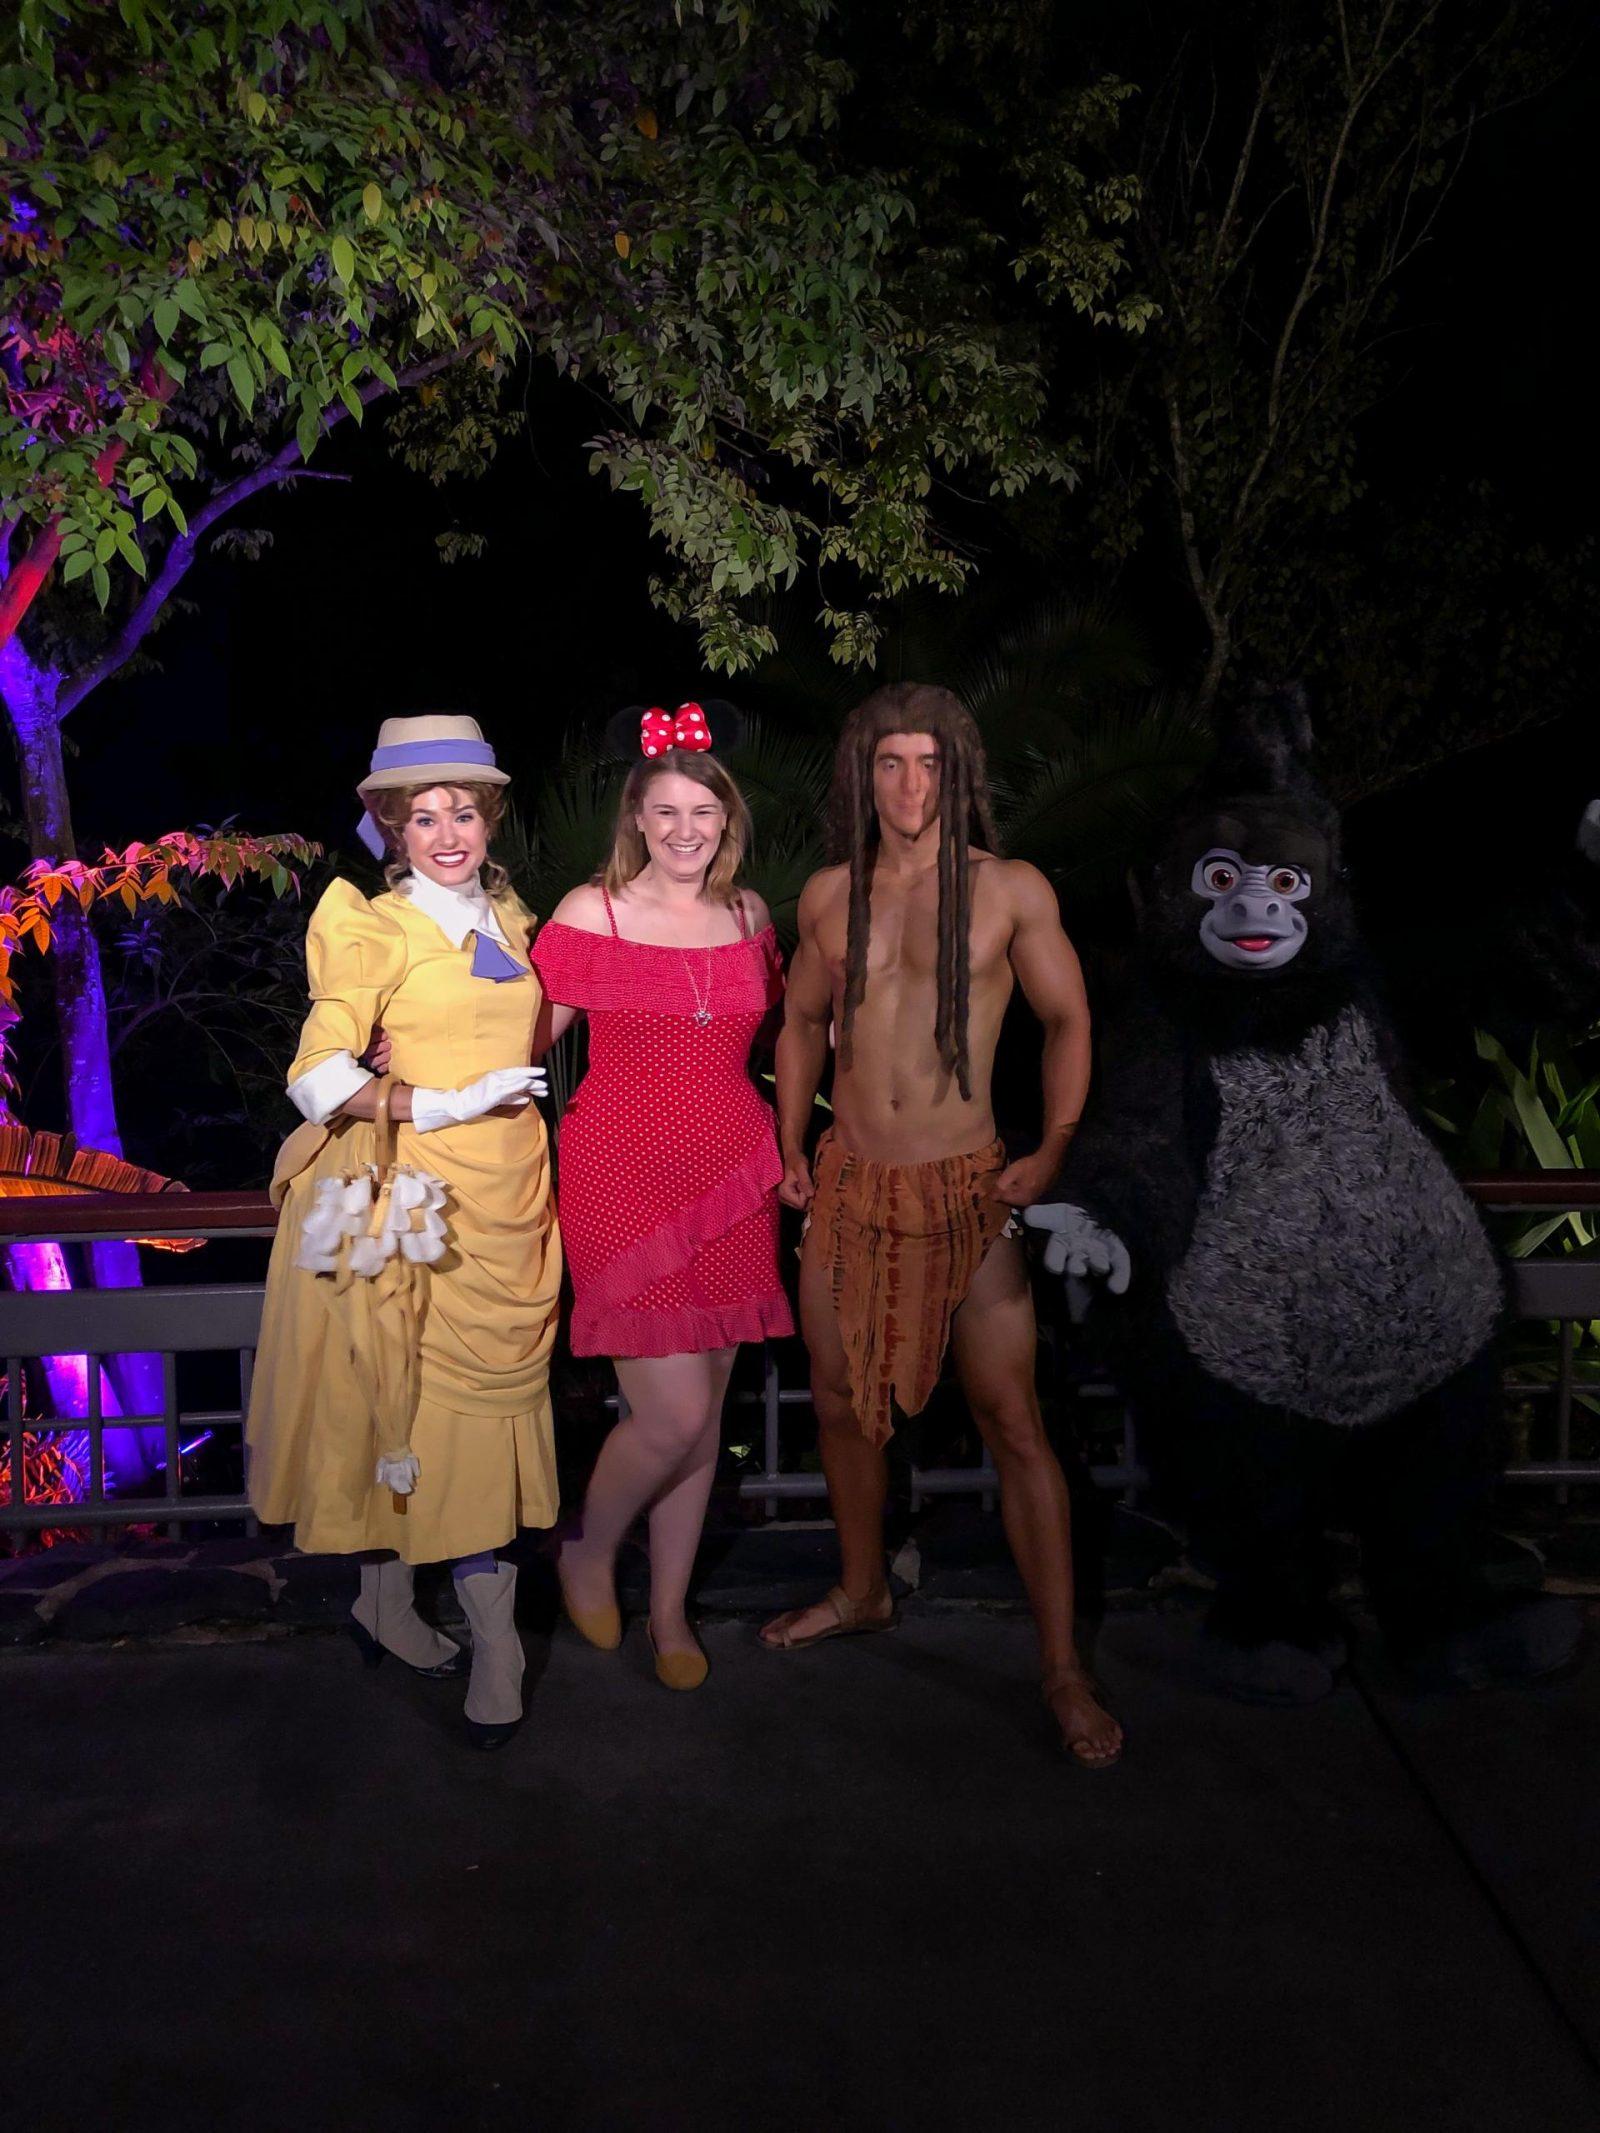 Mickey's Not So Scary Halloween Party Tarzan, Jane and Turk meet and greet